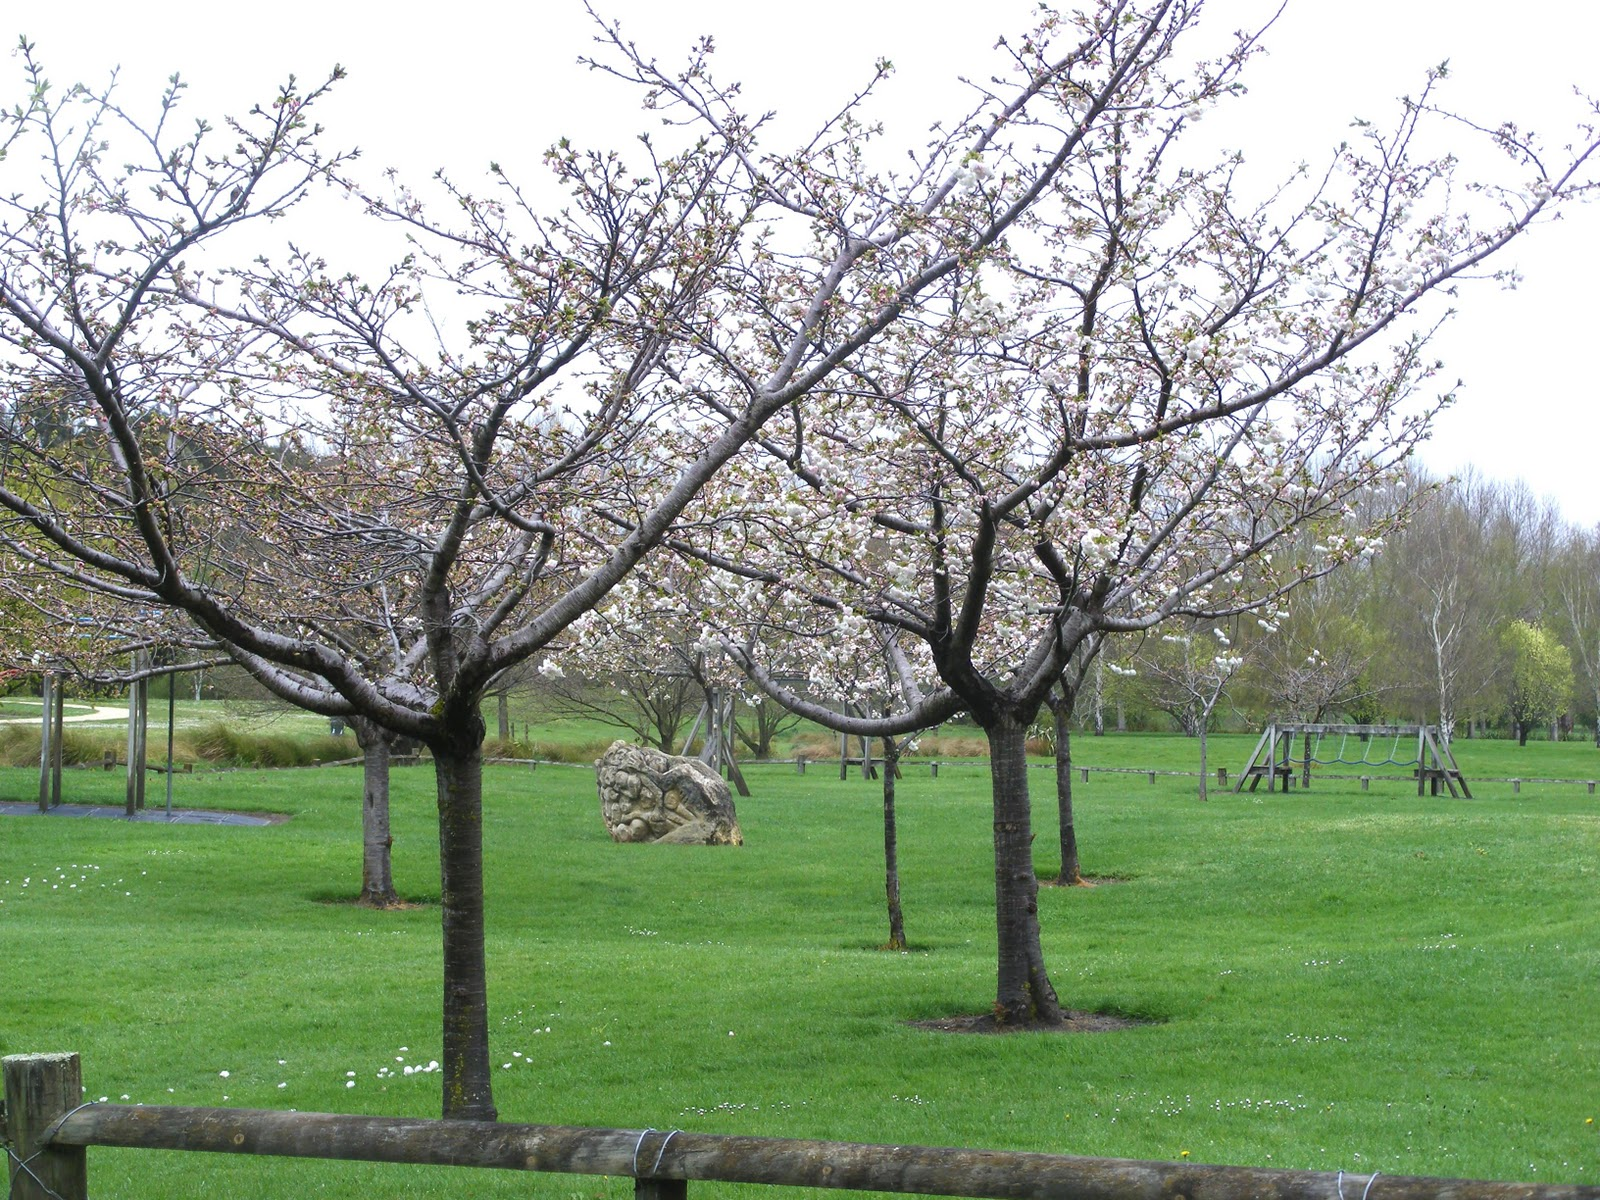 mt fuji cherry tree nz callaghan landscape architect nz prunus shirotae mount fuji